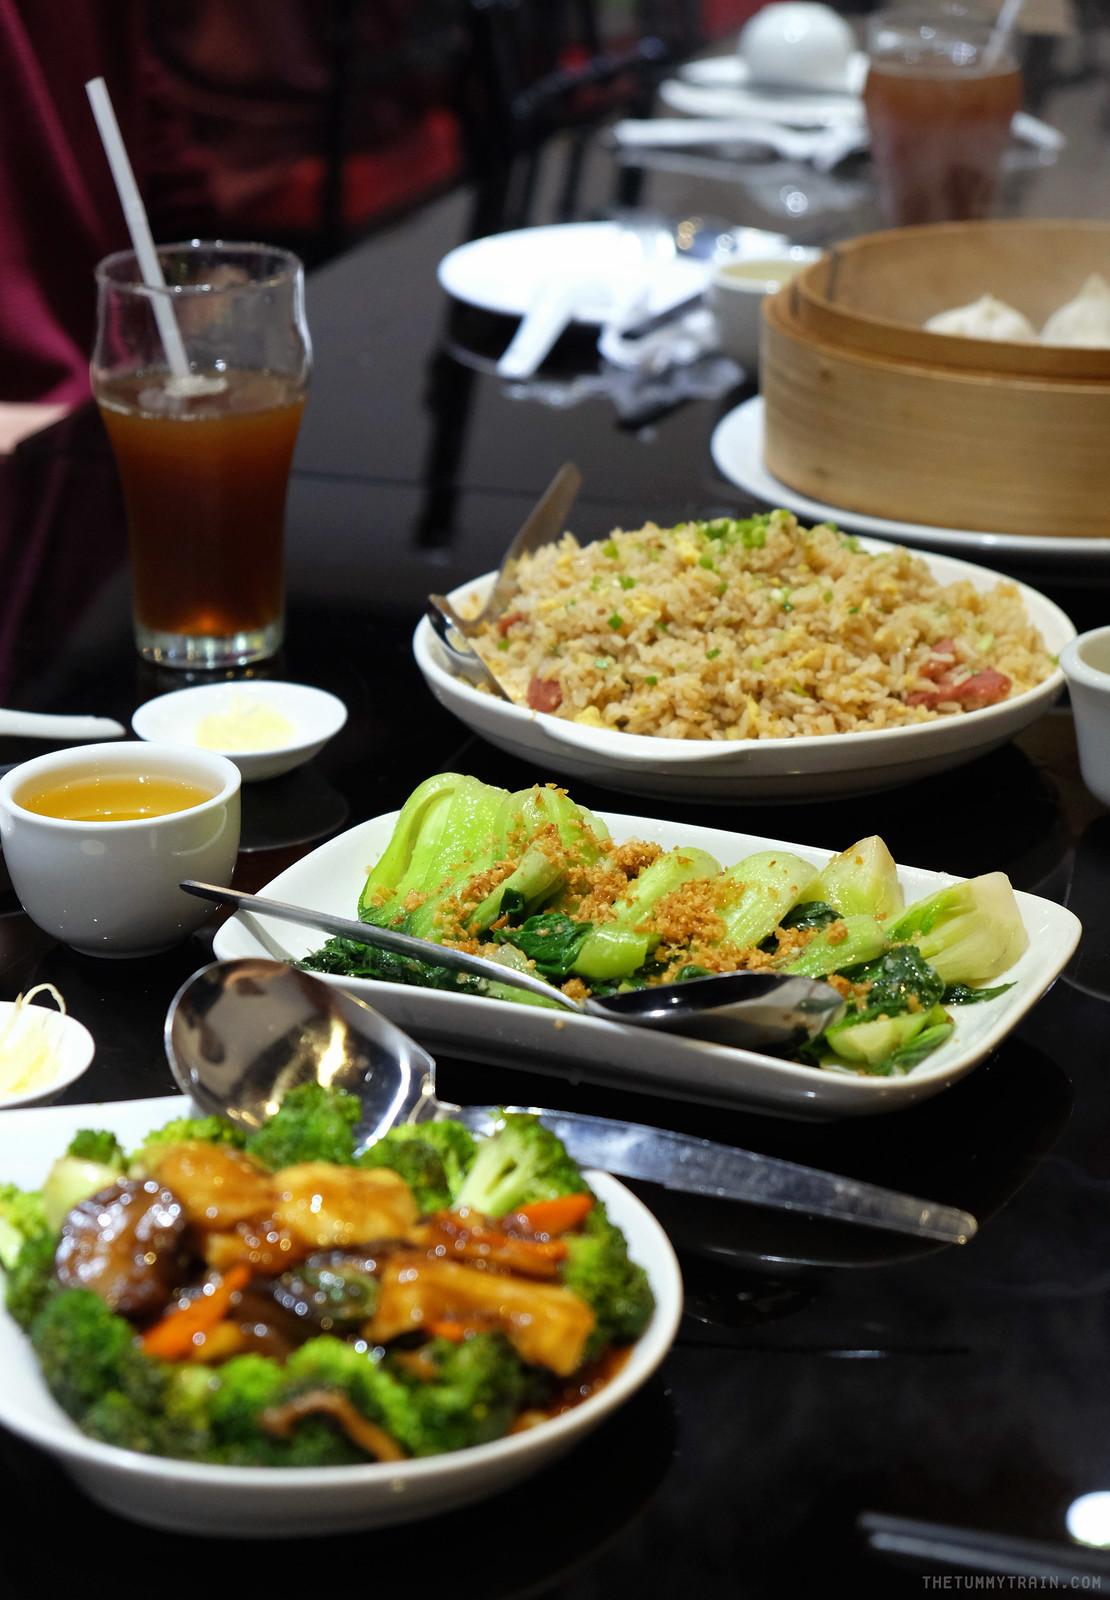 29277279652 a9e98d963a h - A spot of Taiwanese food at Taipei Taipei QC